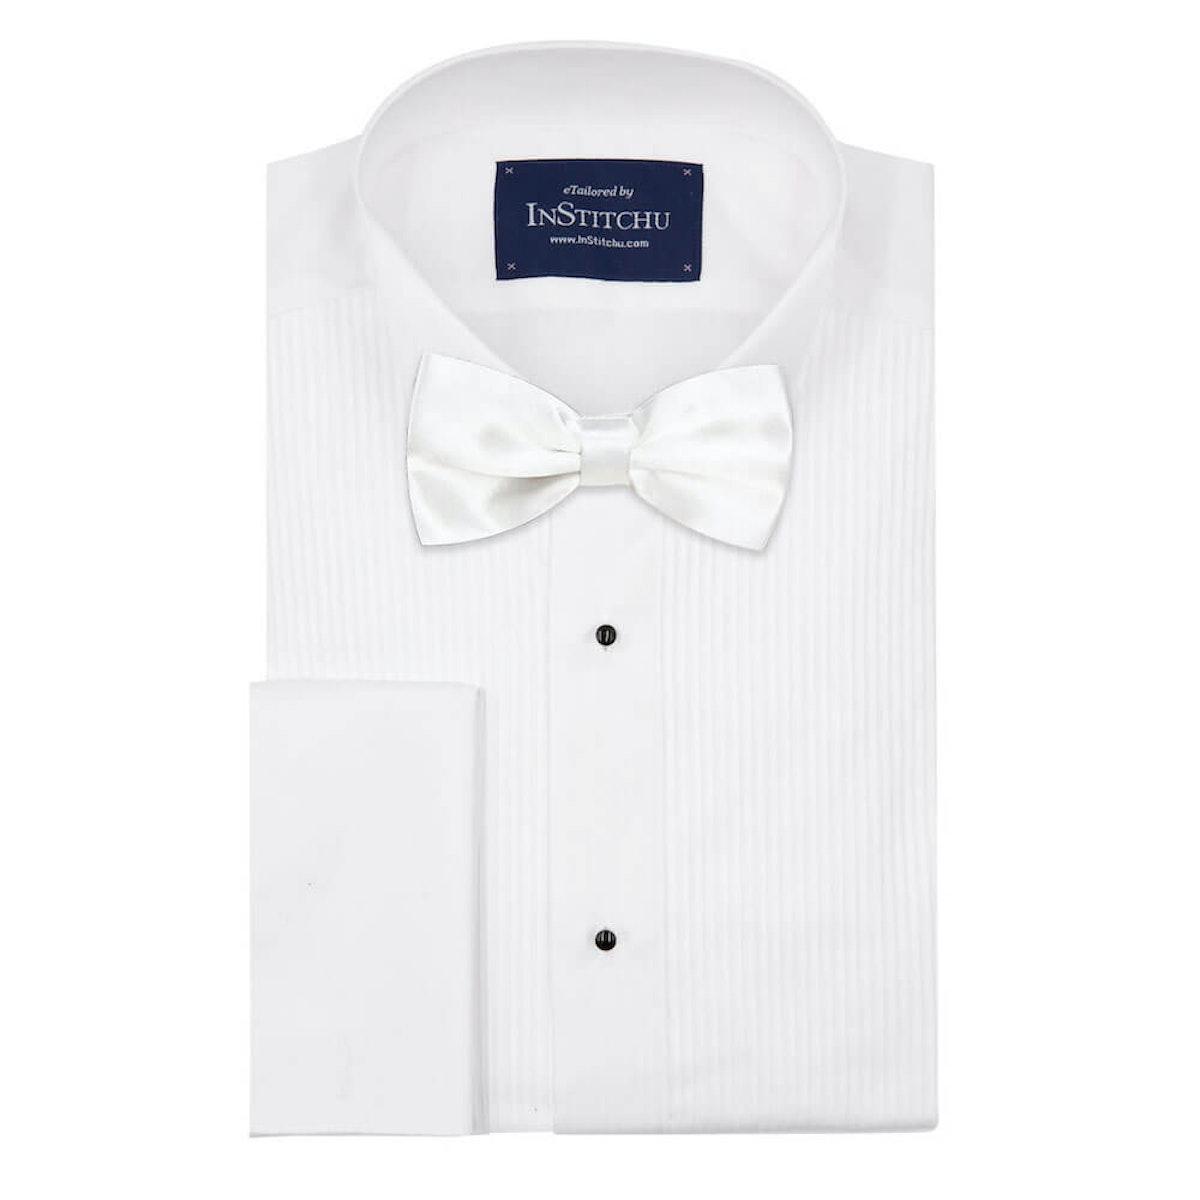 InStitchu Accessories bow-tie InStitchu White Bow Tie